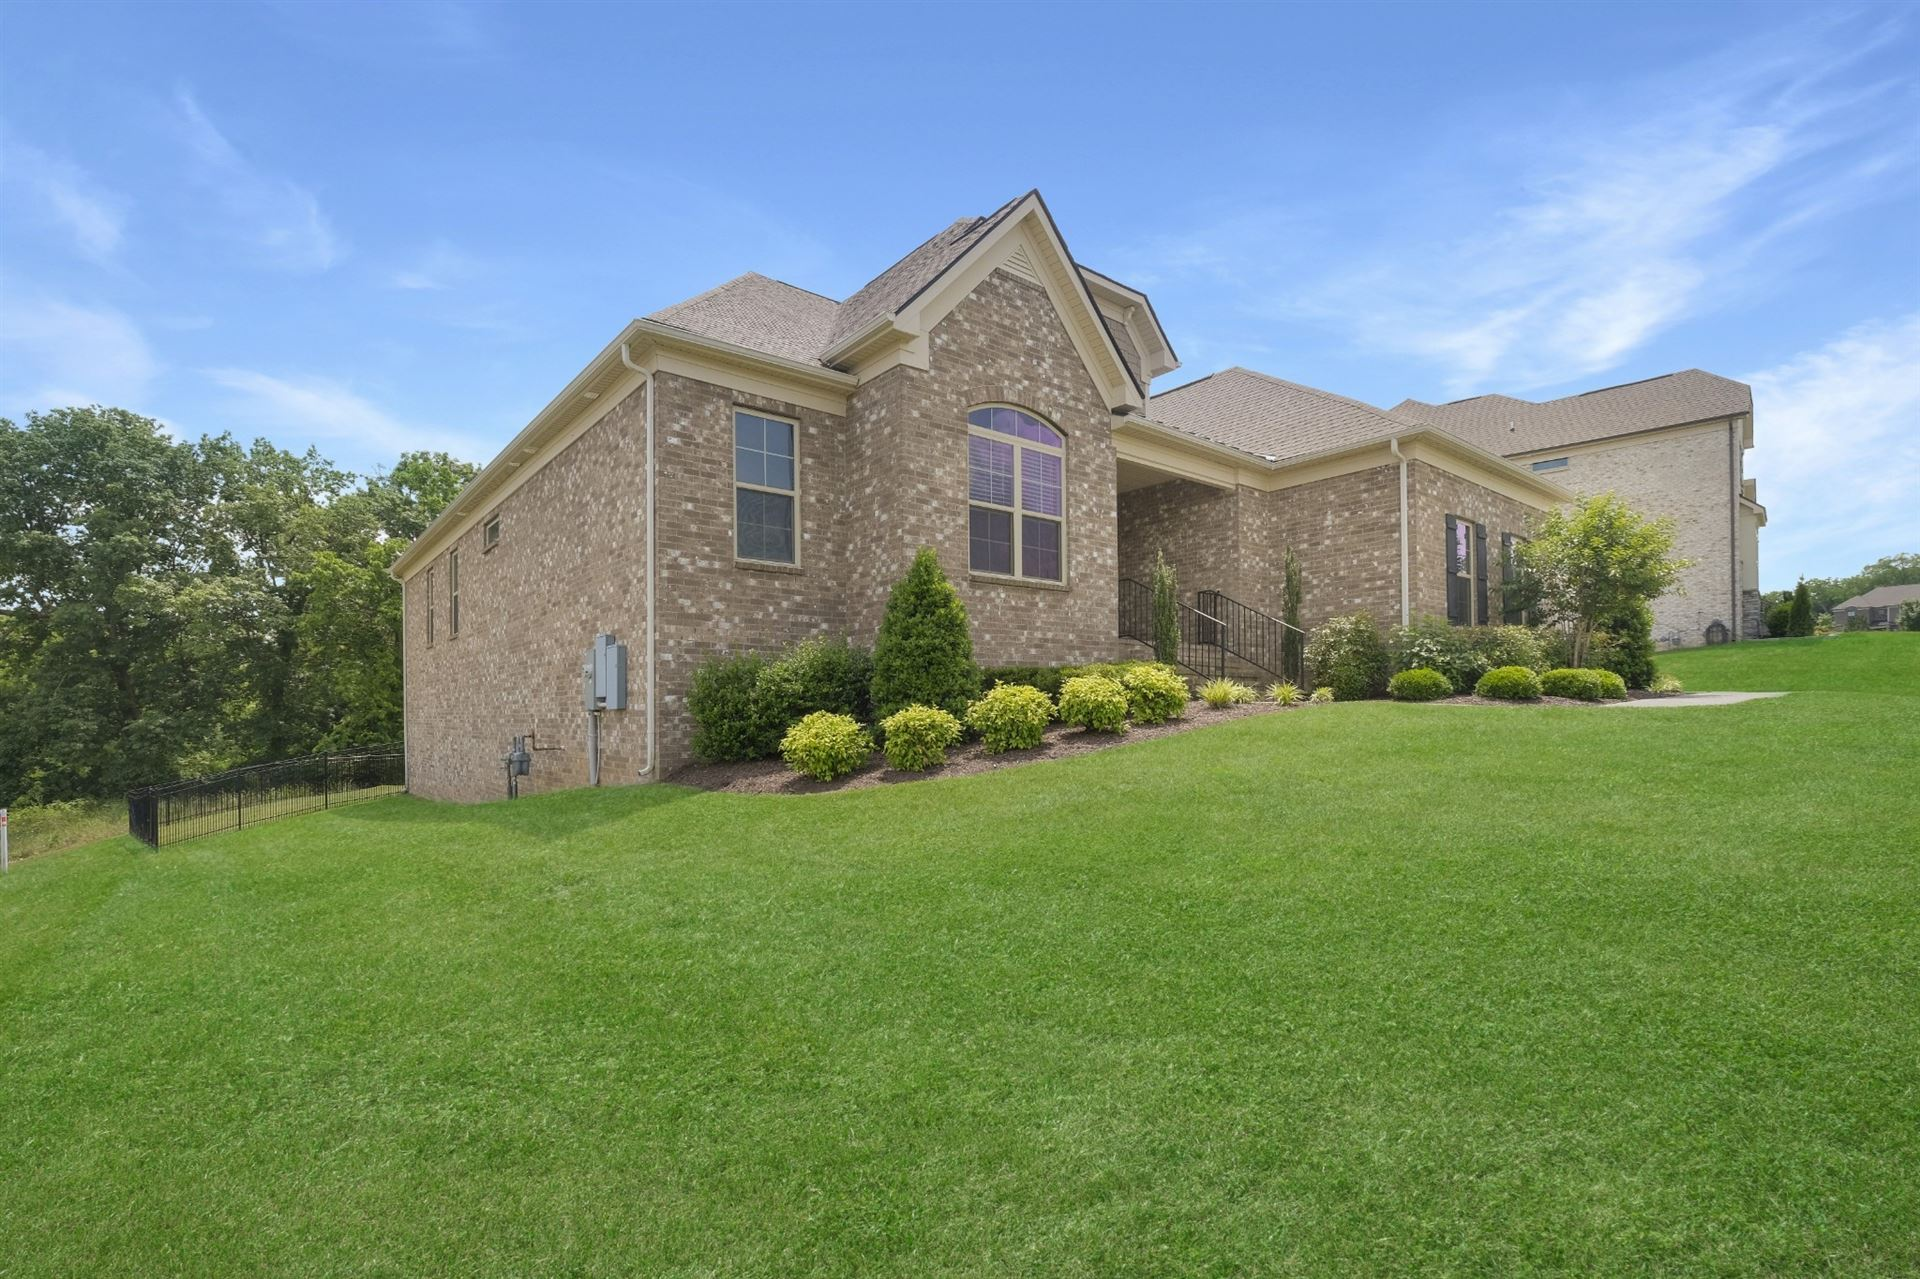 Photo of 9499 Stillbrook Trce, Brentwood, TN 37027 (MLS # 2290564)